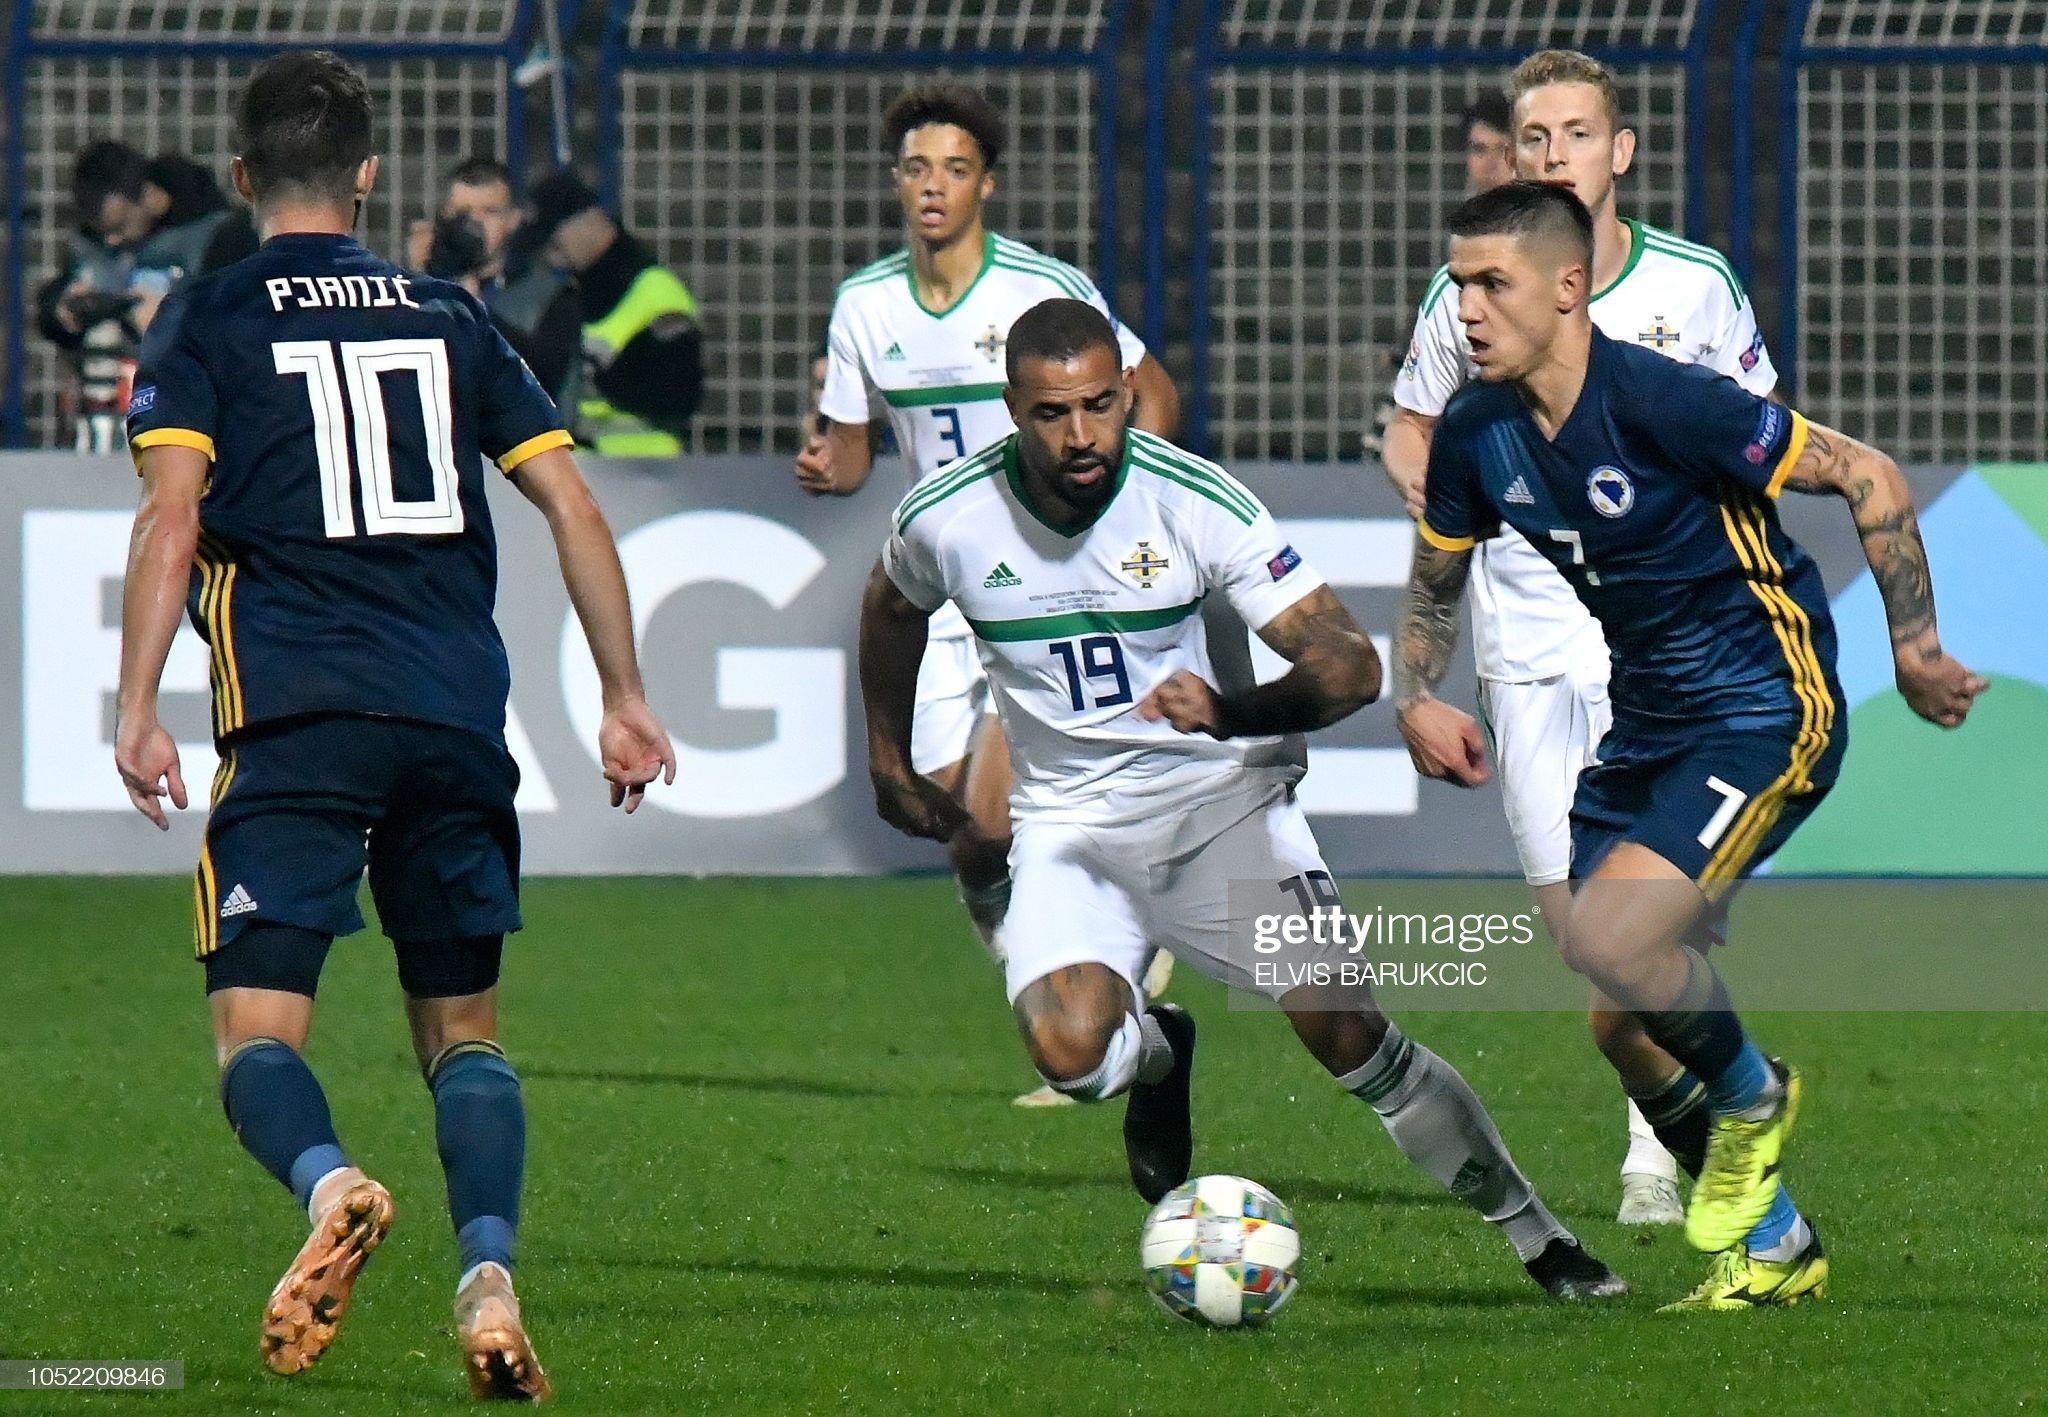 Bosnia-Herzegovina vs Northern Ireland Preview, prediction and odds